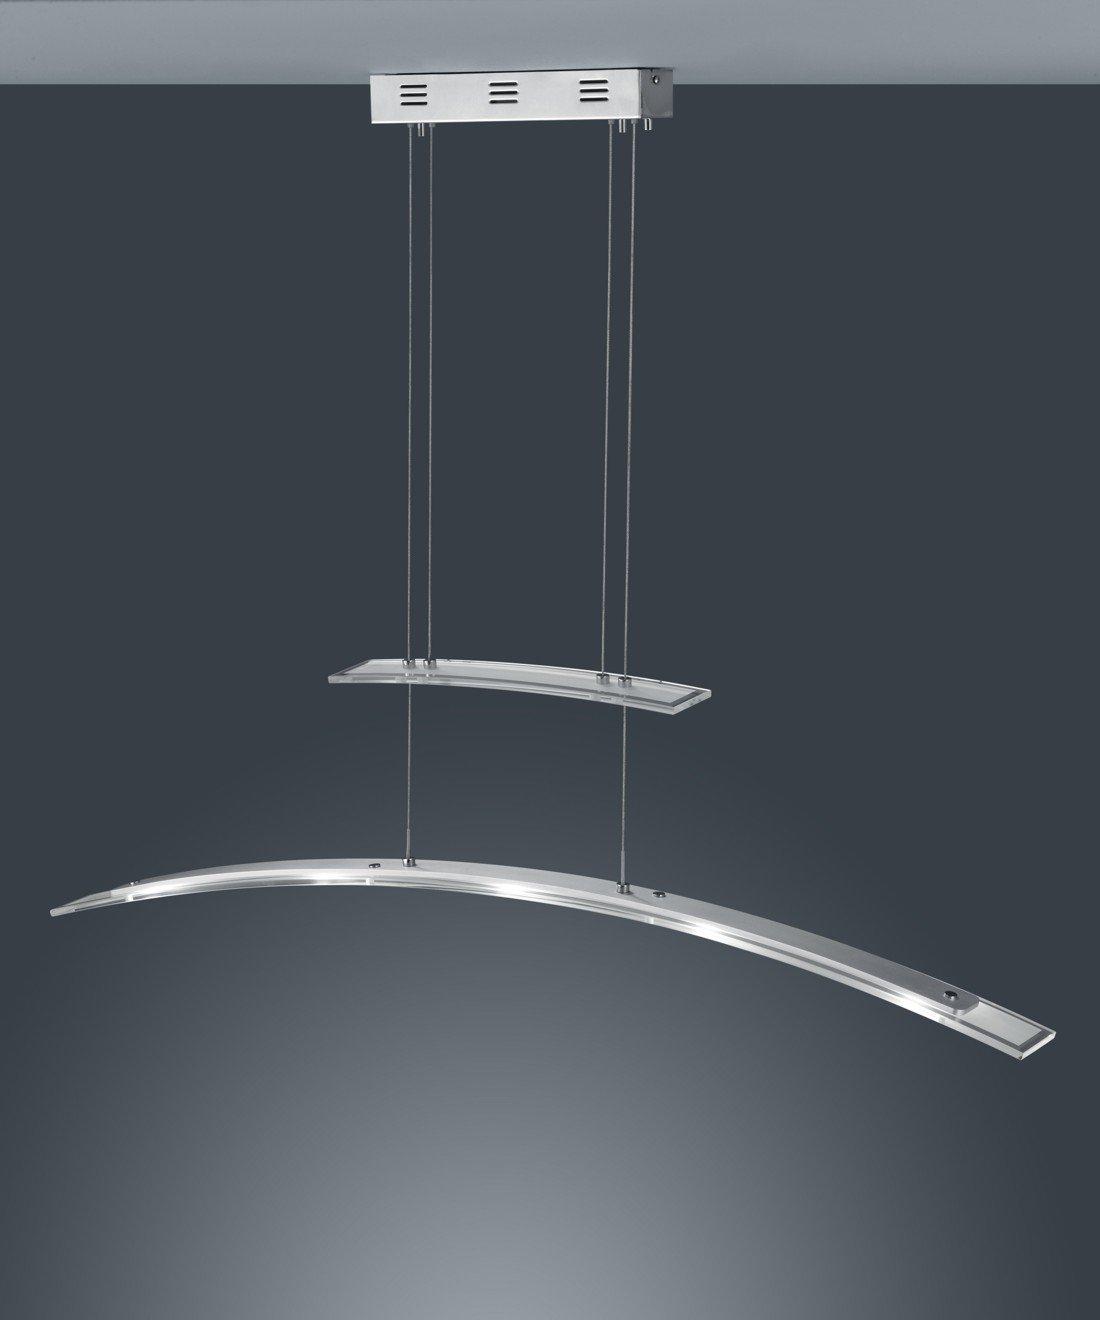 Trio Leuchten LED-JoJo-Pendelleuchte in Chrom/Aluminium, Glas weiß ...